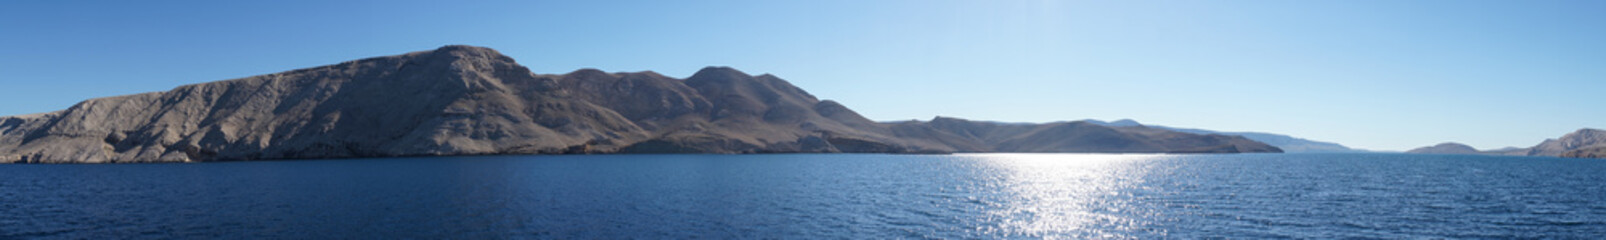 Küsten Panorama Insel Pag